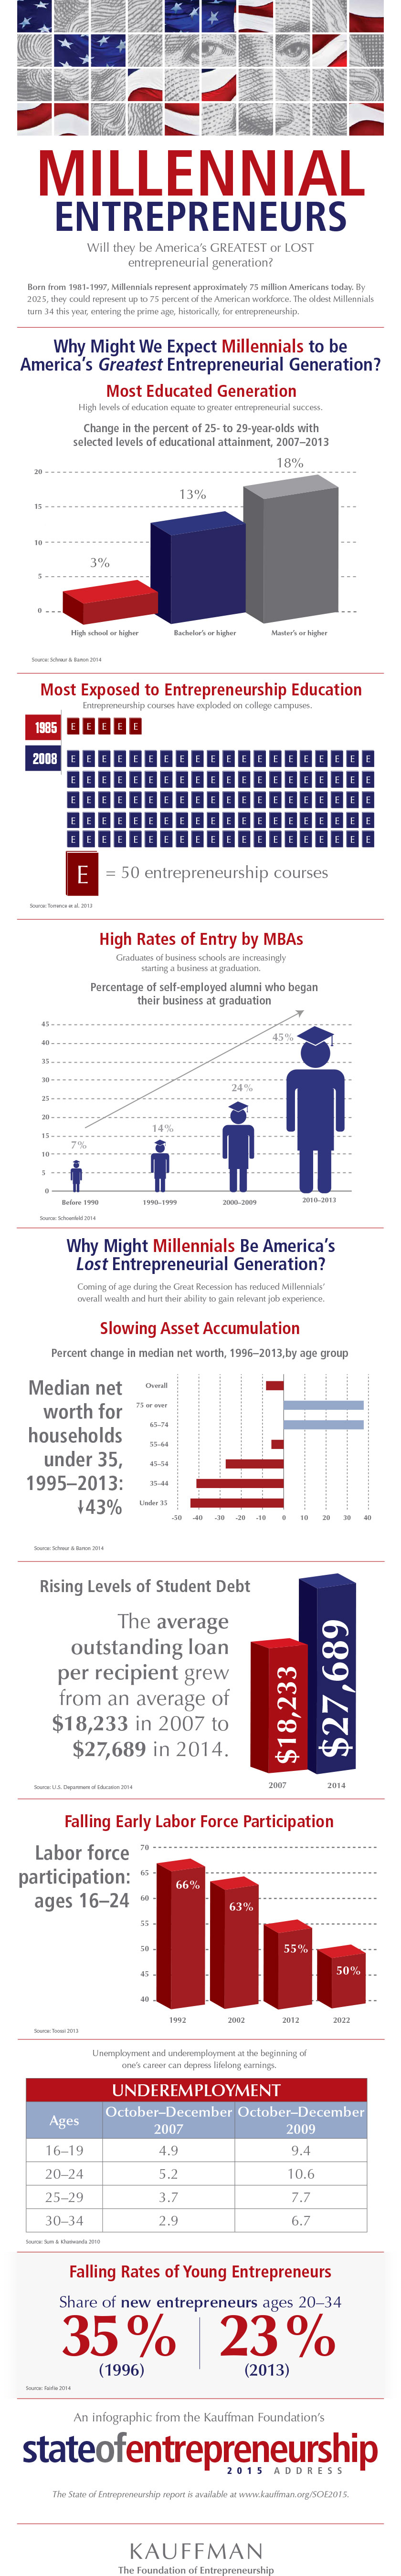 Millennial entrepreneurship infographic makes millennials most entrepreneurial generation ever